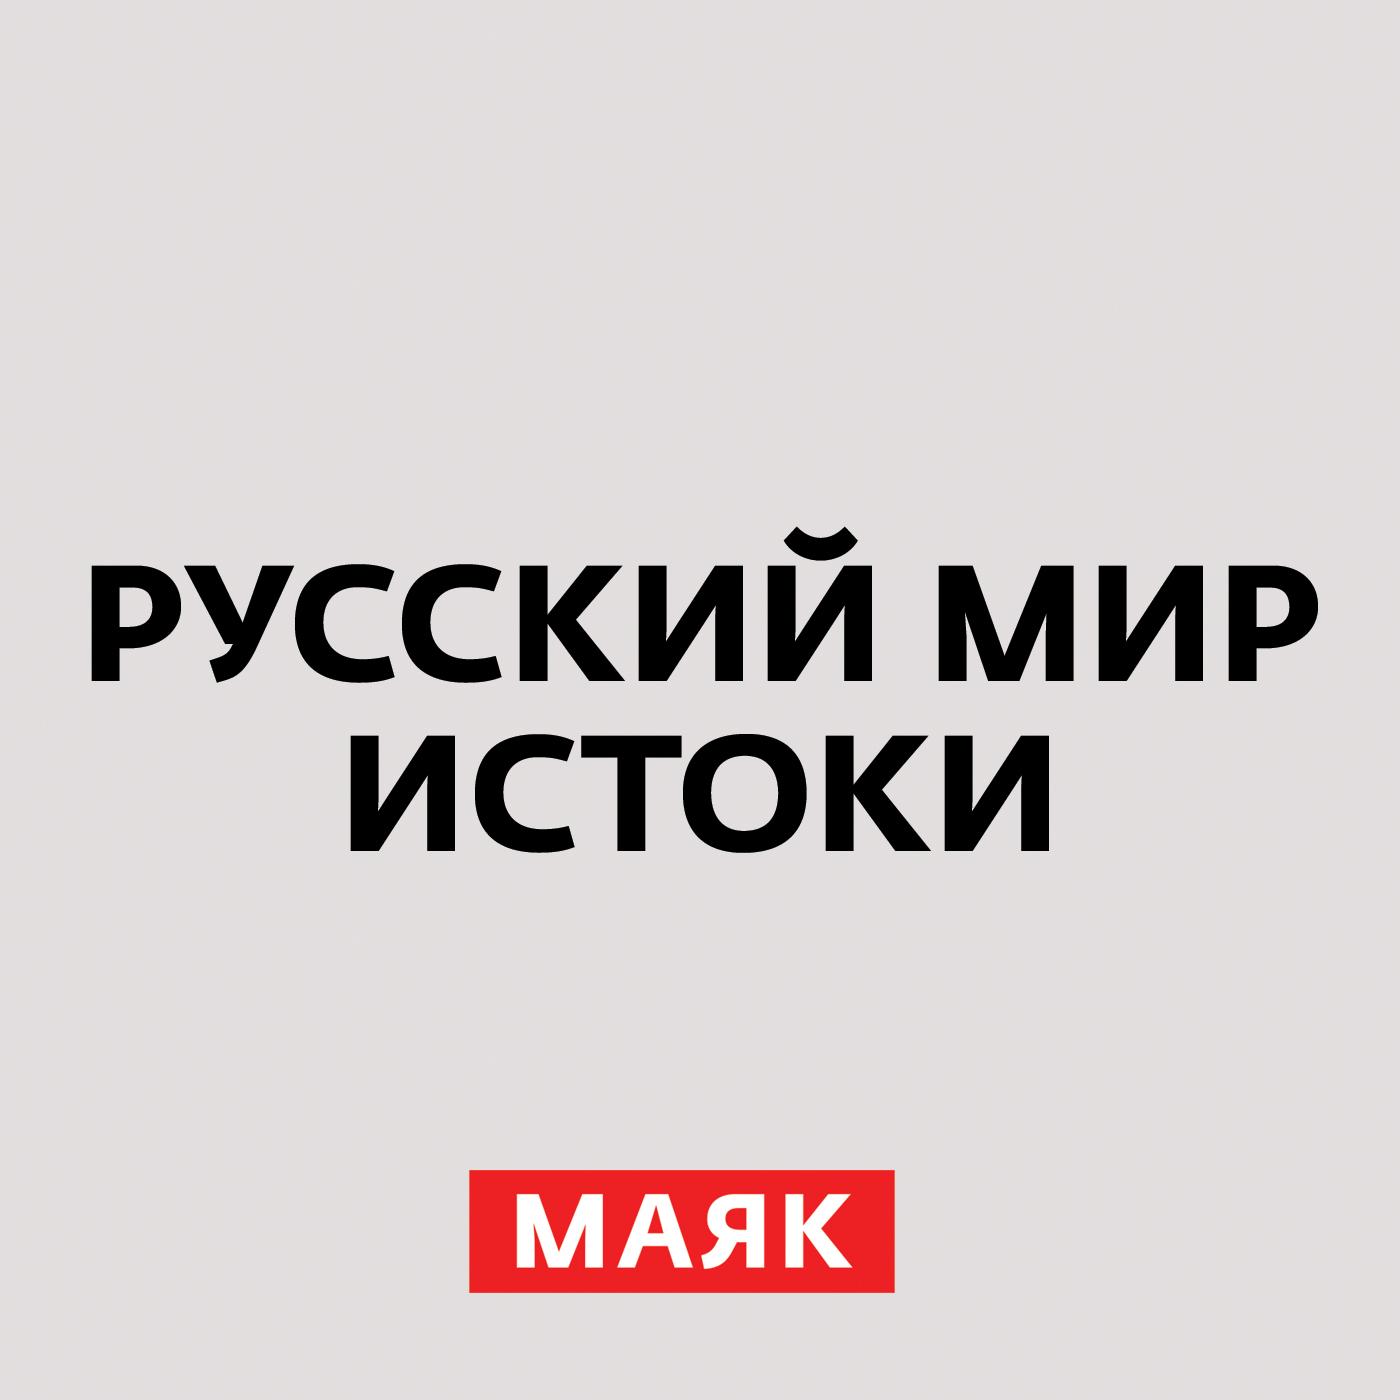 Творческий коллектив радио «Маяк» Лжедмитрий I (продолжение) творческий коллектив радио маяк теща